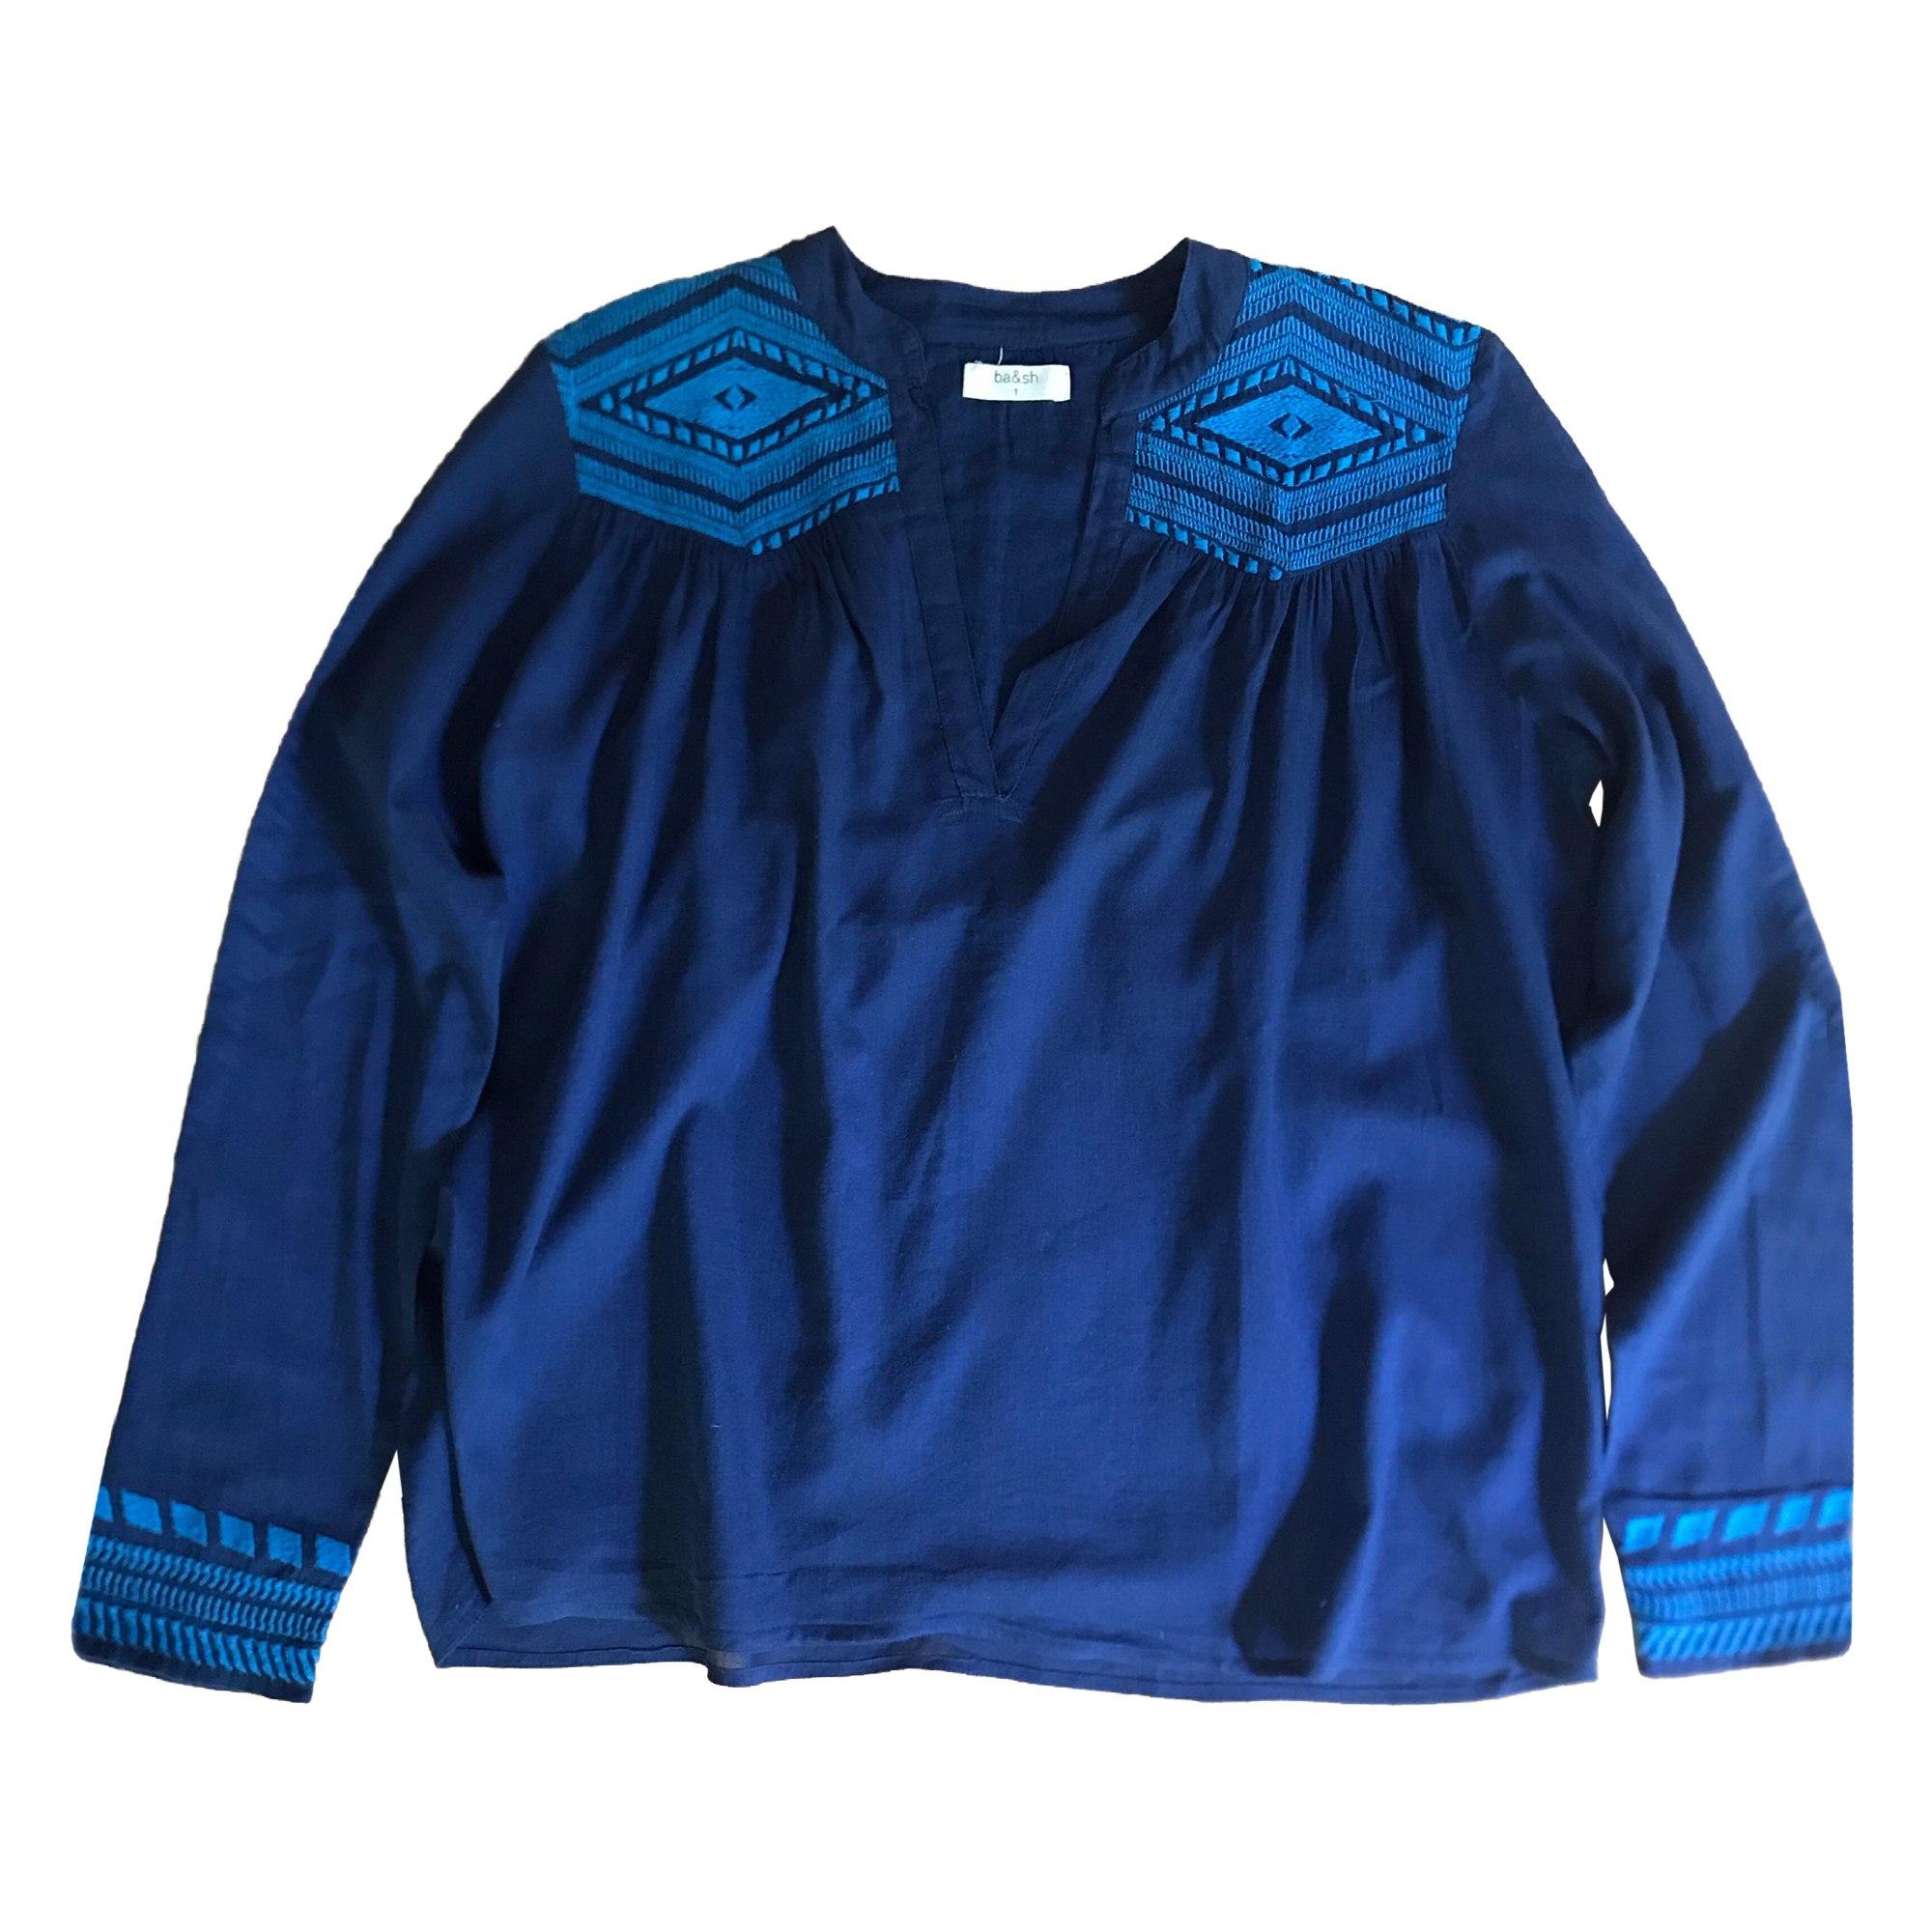 Blouse BA&SH Bleu, bleu marine, bleu turquoise